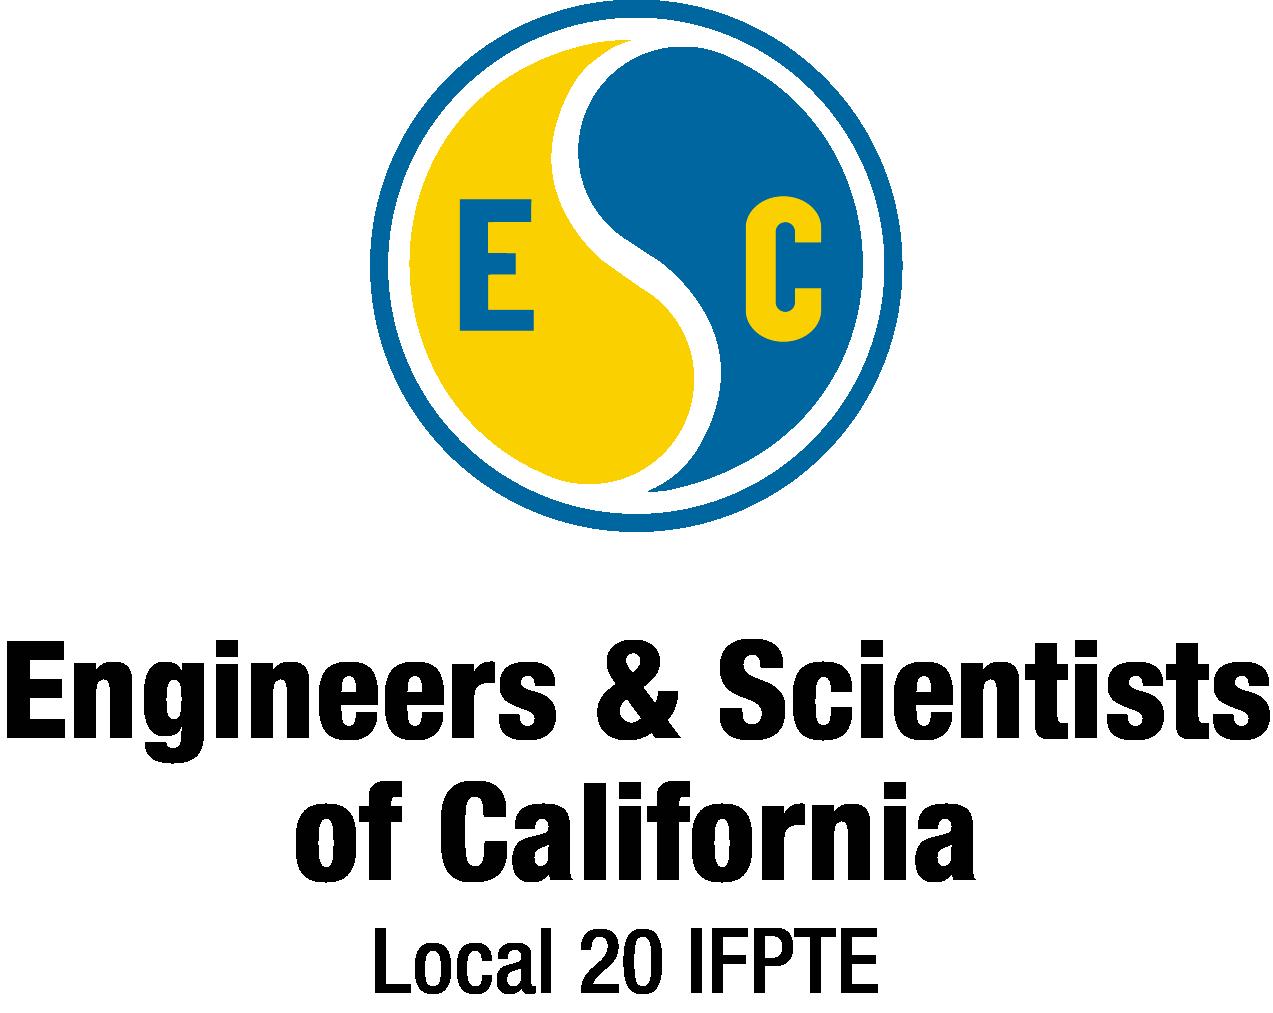 ESCL20_type_logo_color_2017_72.png